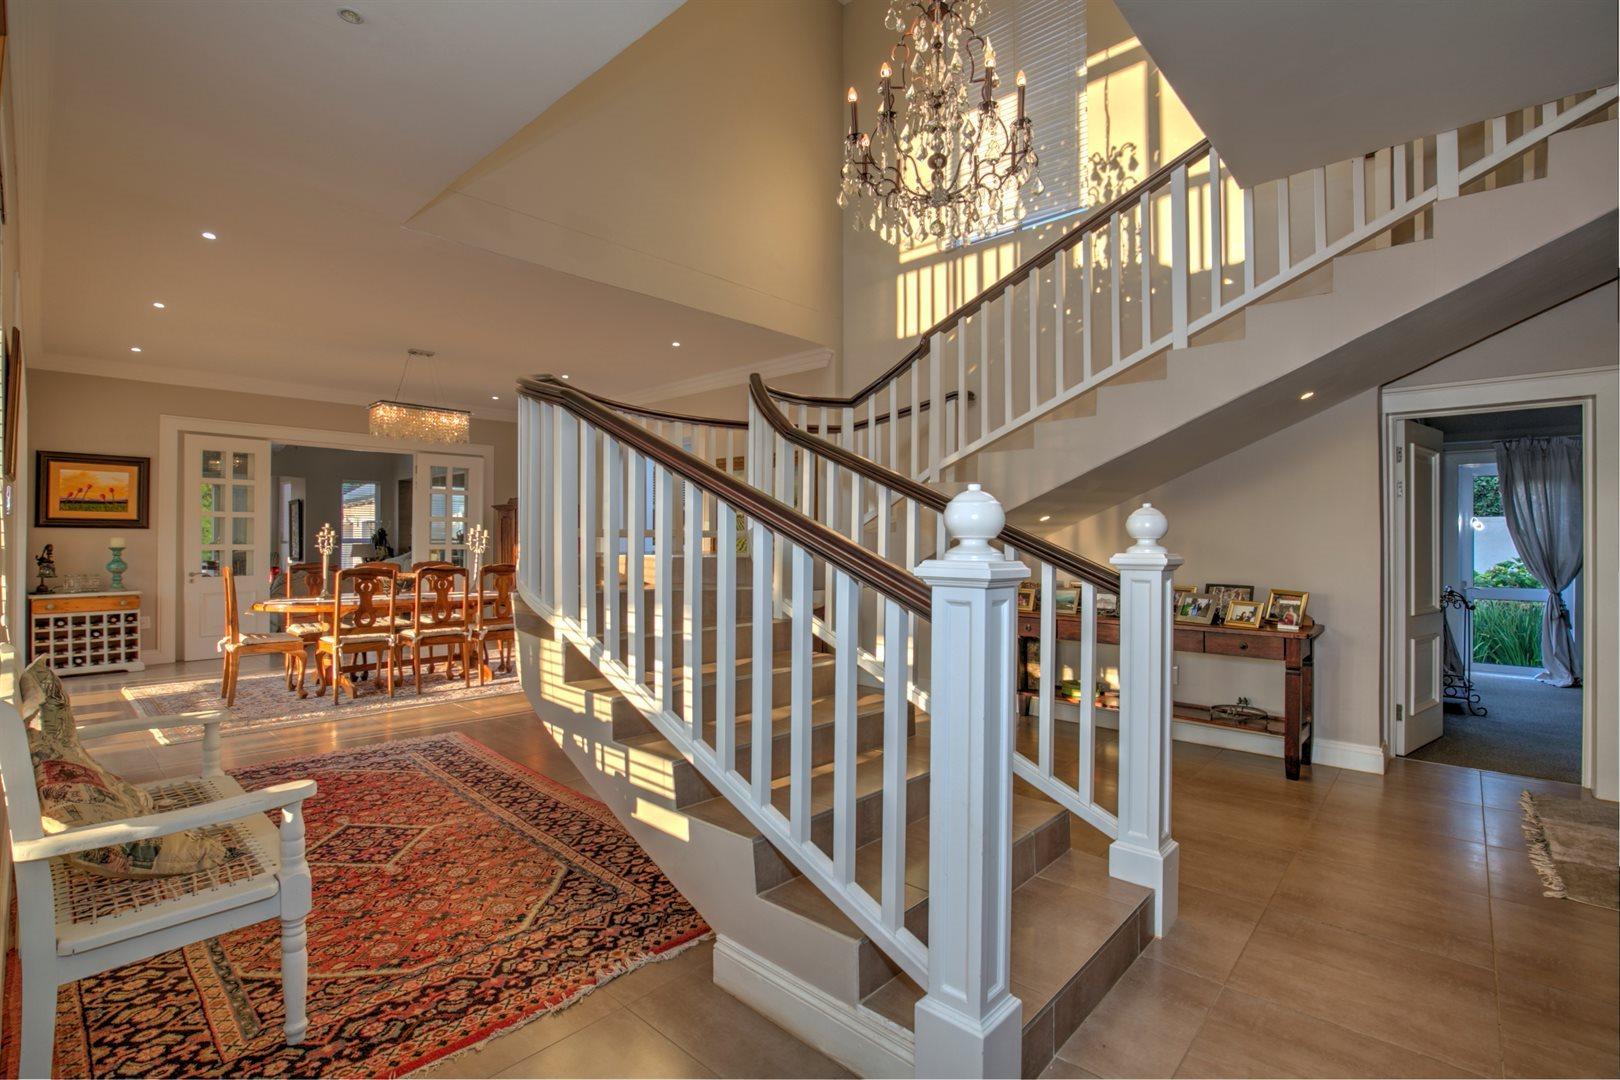 Southdowns Estate property for sale. Ref No: 13622989. Picture no 13